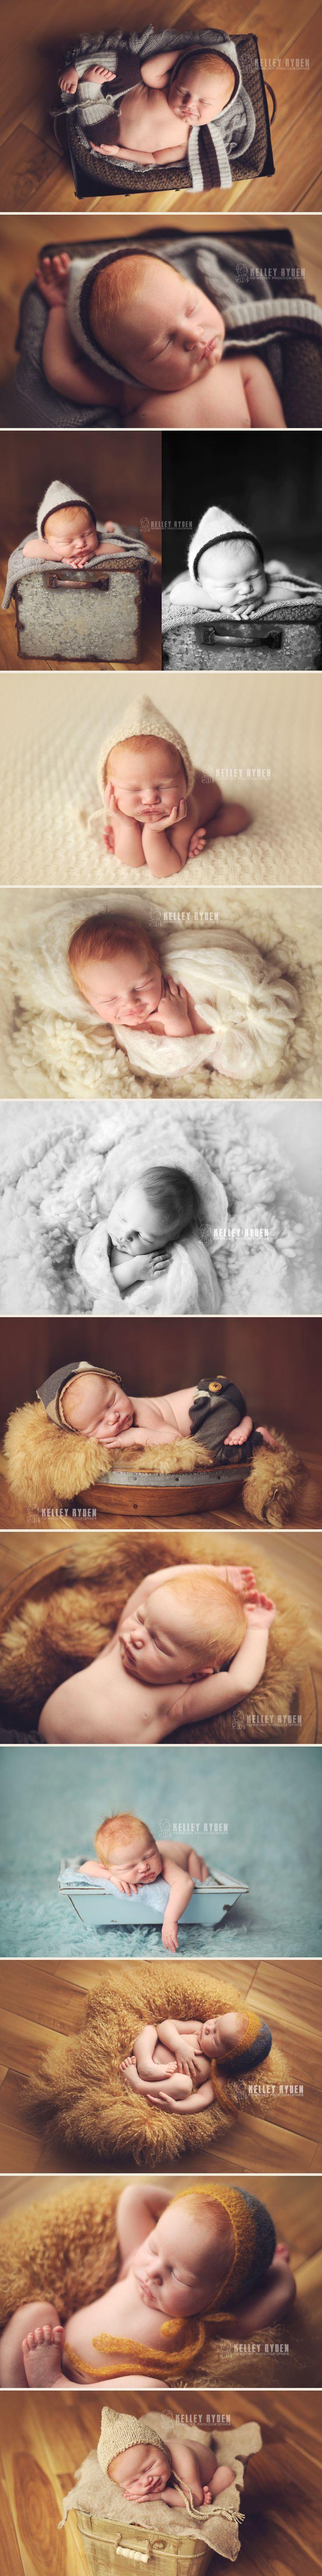 Kelley Ryden Blog - newborn and baby photographer Omaha Nebraska